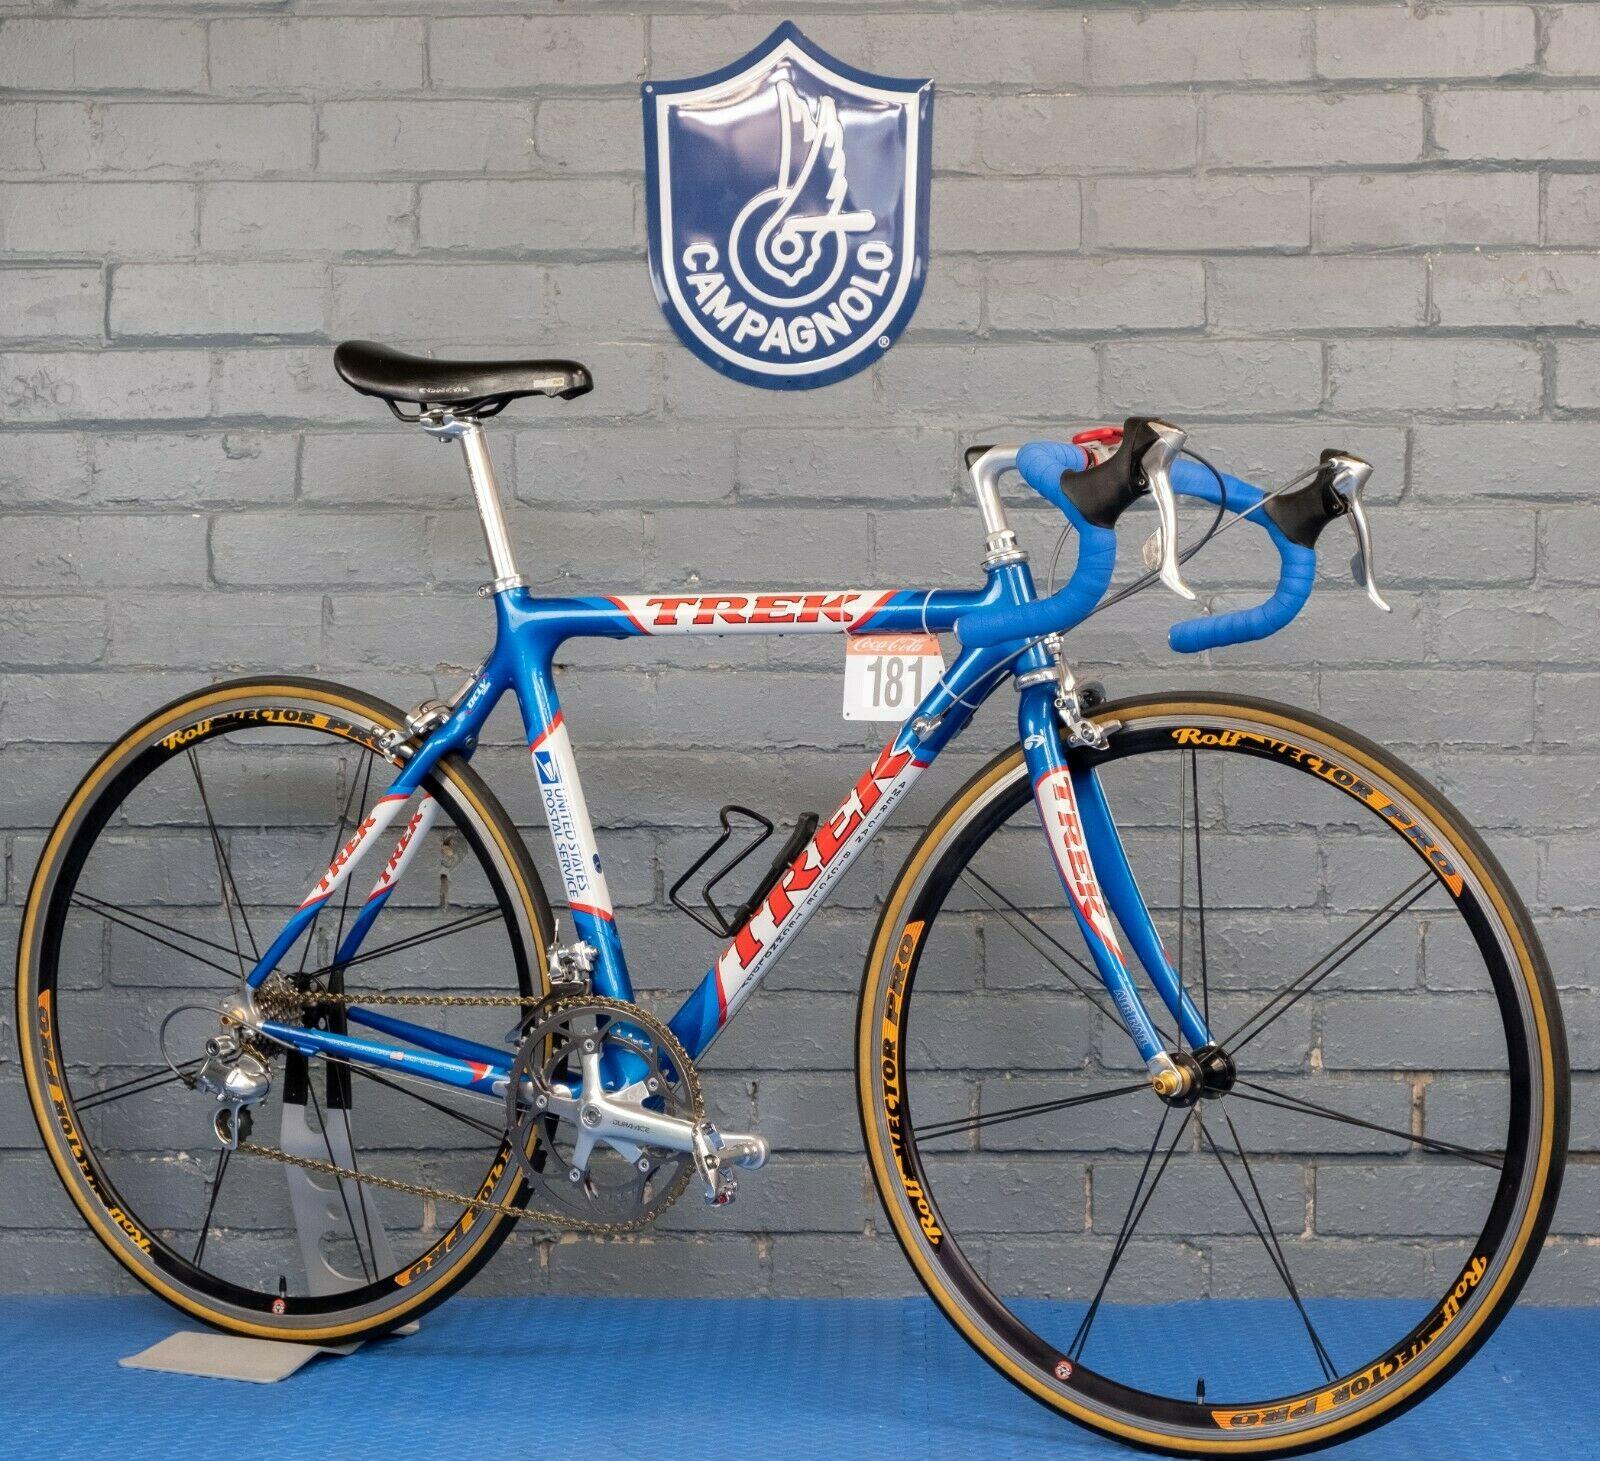 Ebay Finds Lance Armstrong Replica Trek 5500 Oclv Cyclingnews